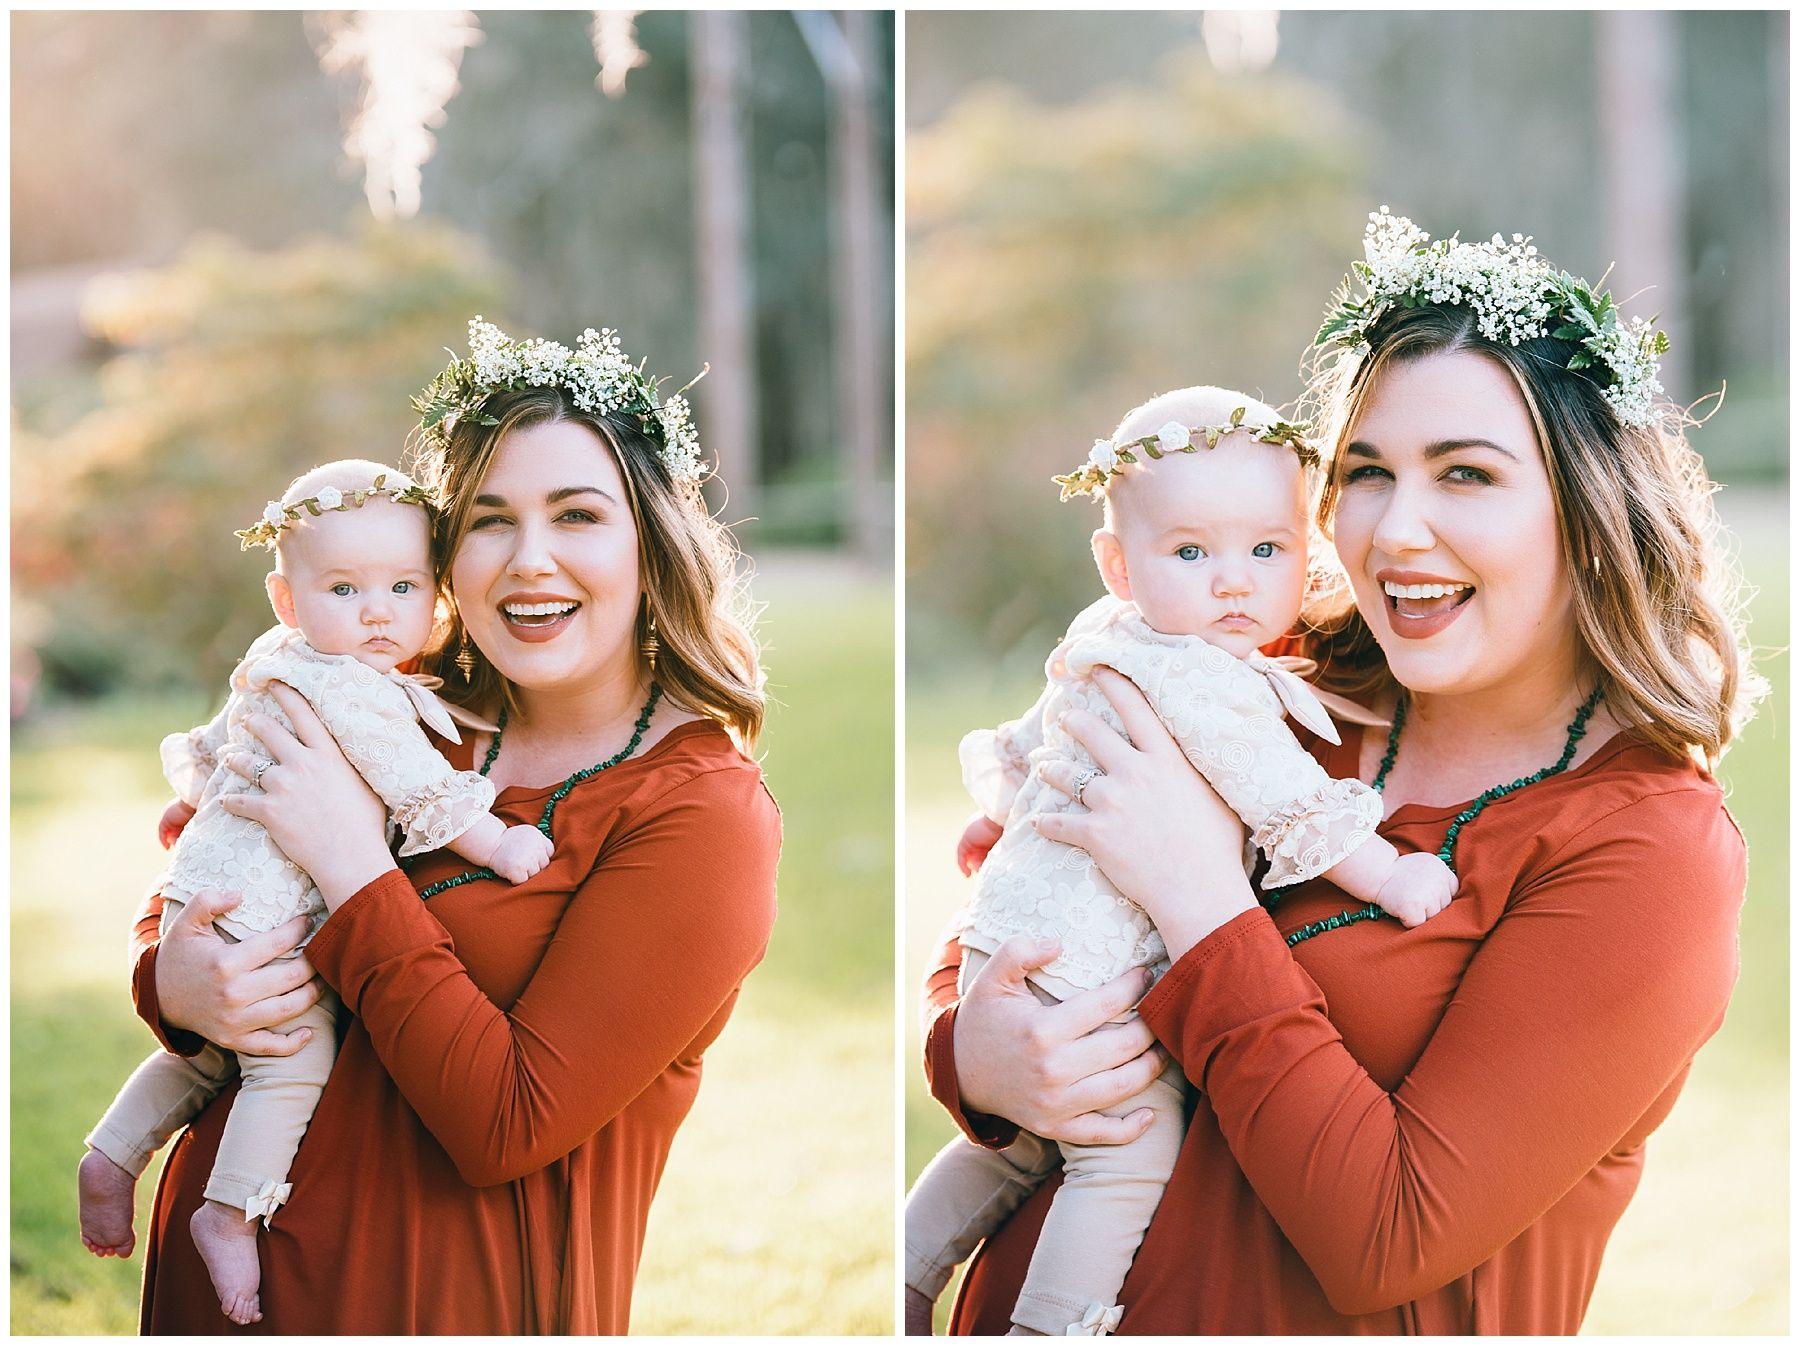 Babies, Flowers, and England   Naomi Lynn Families   Pinterest ...